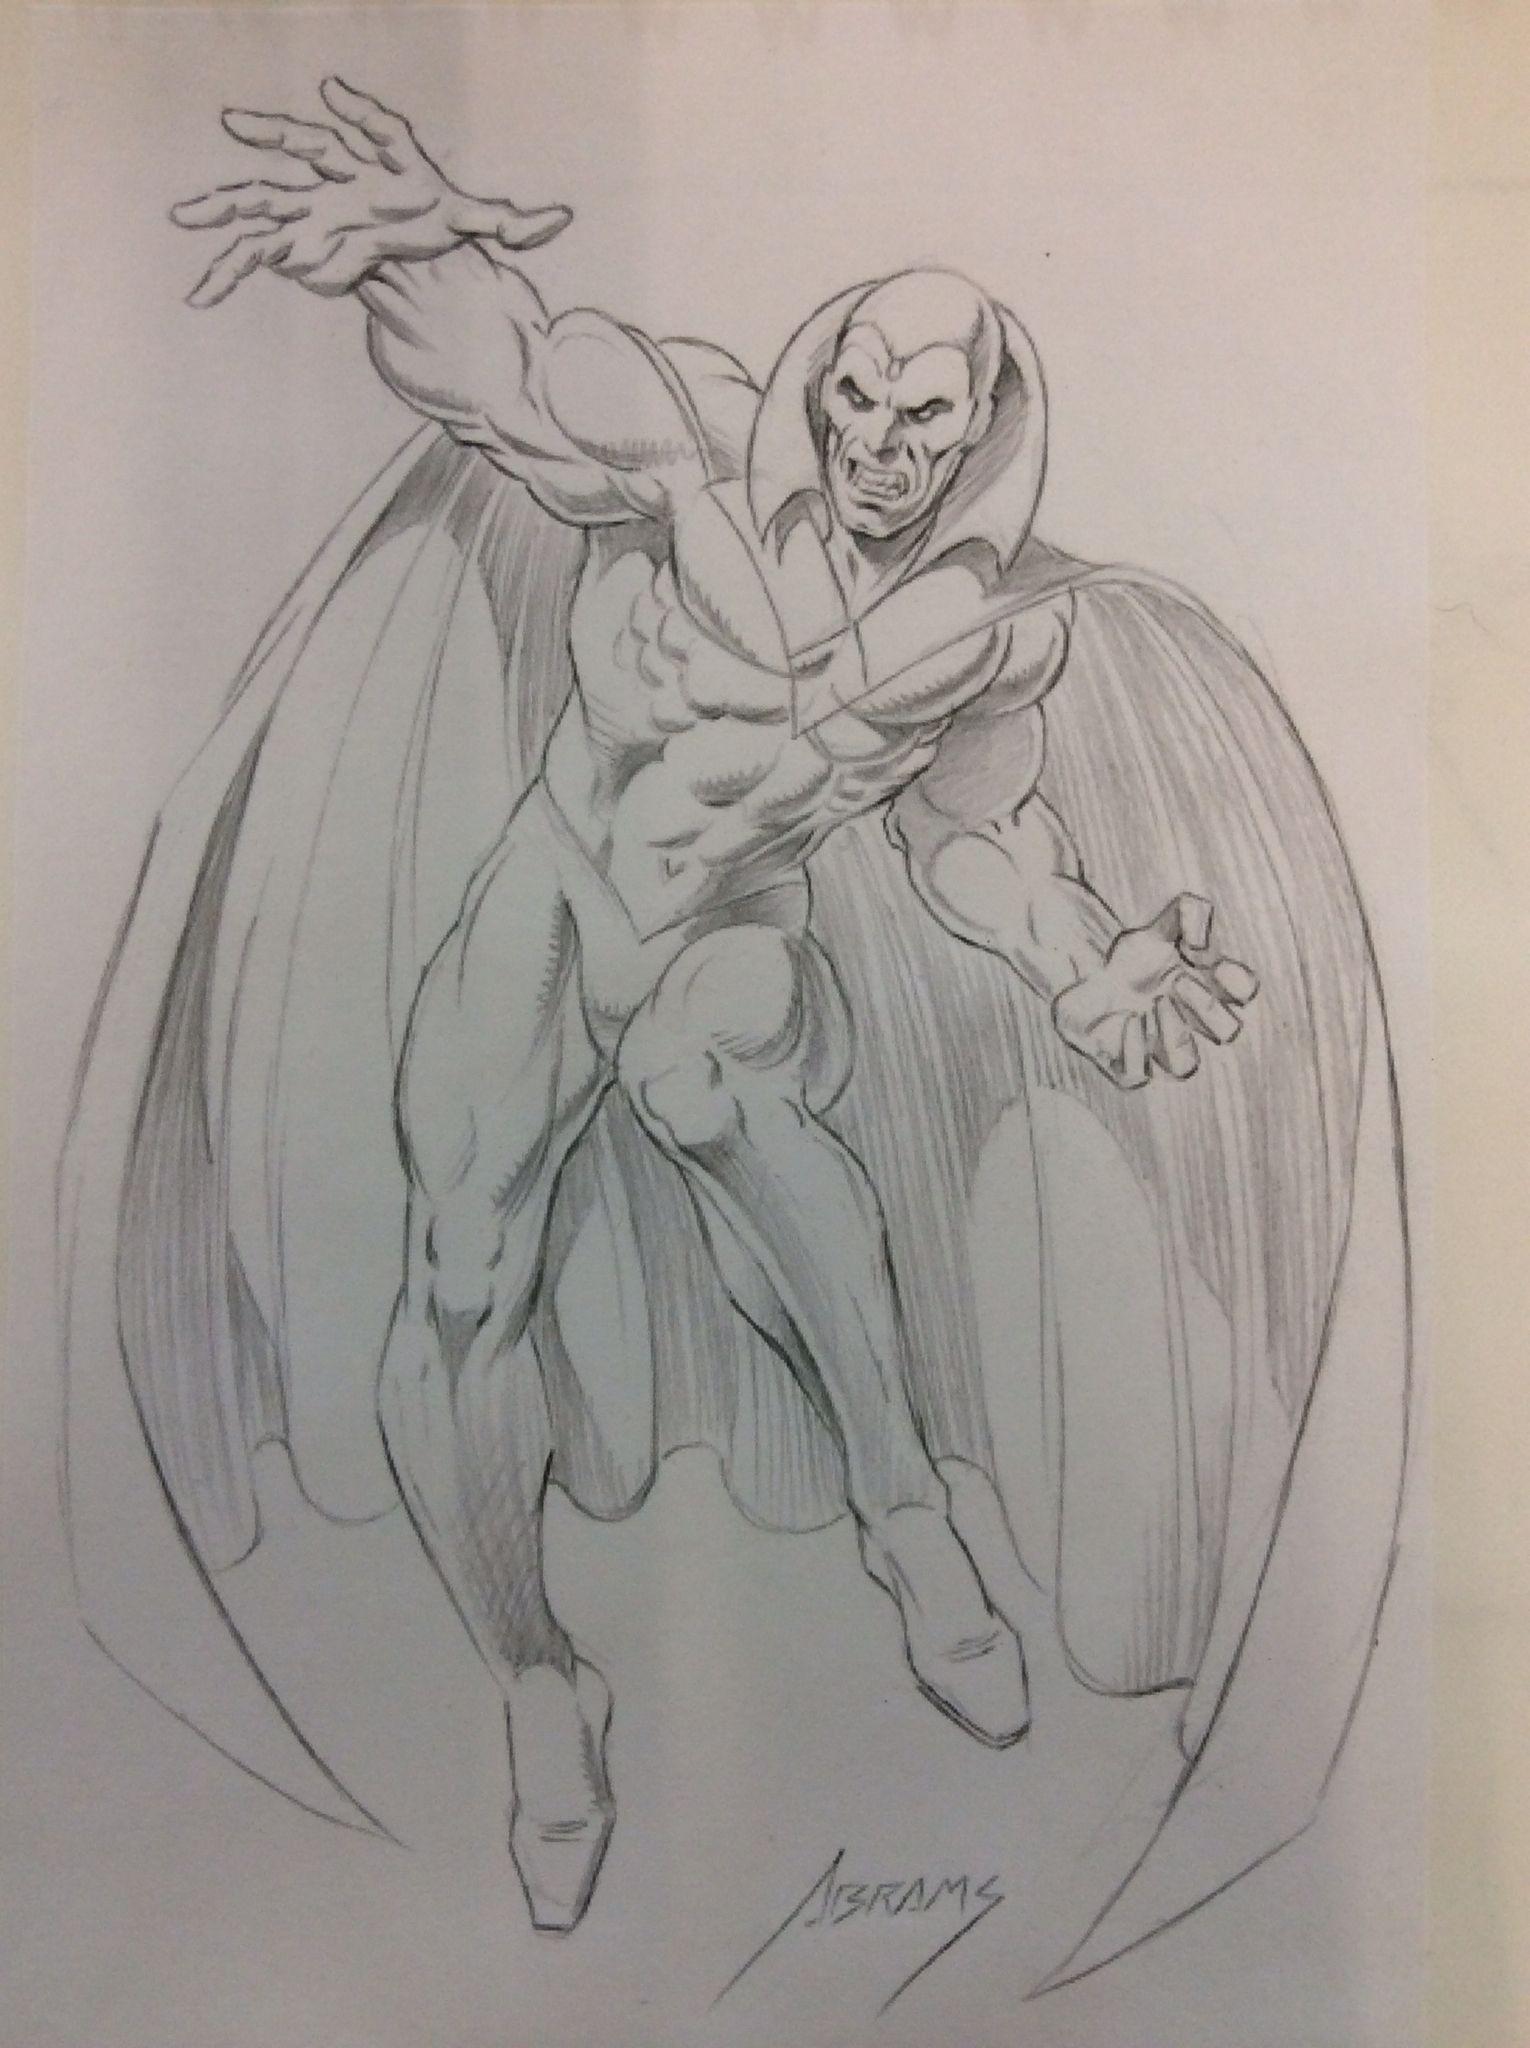 Vision full body sketch by abrams